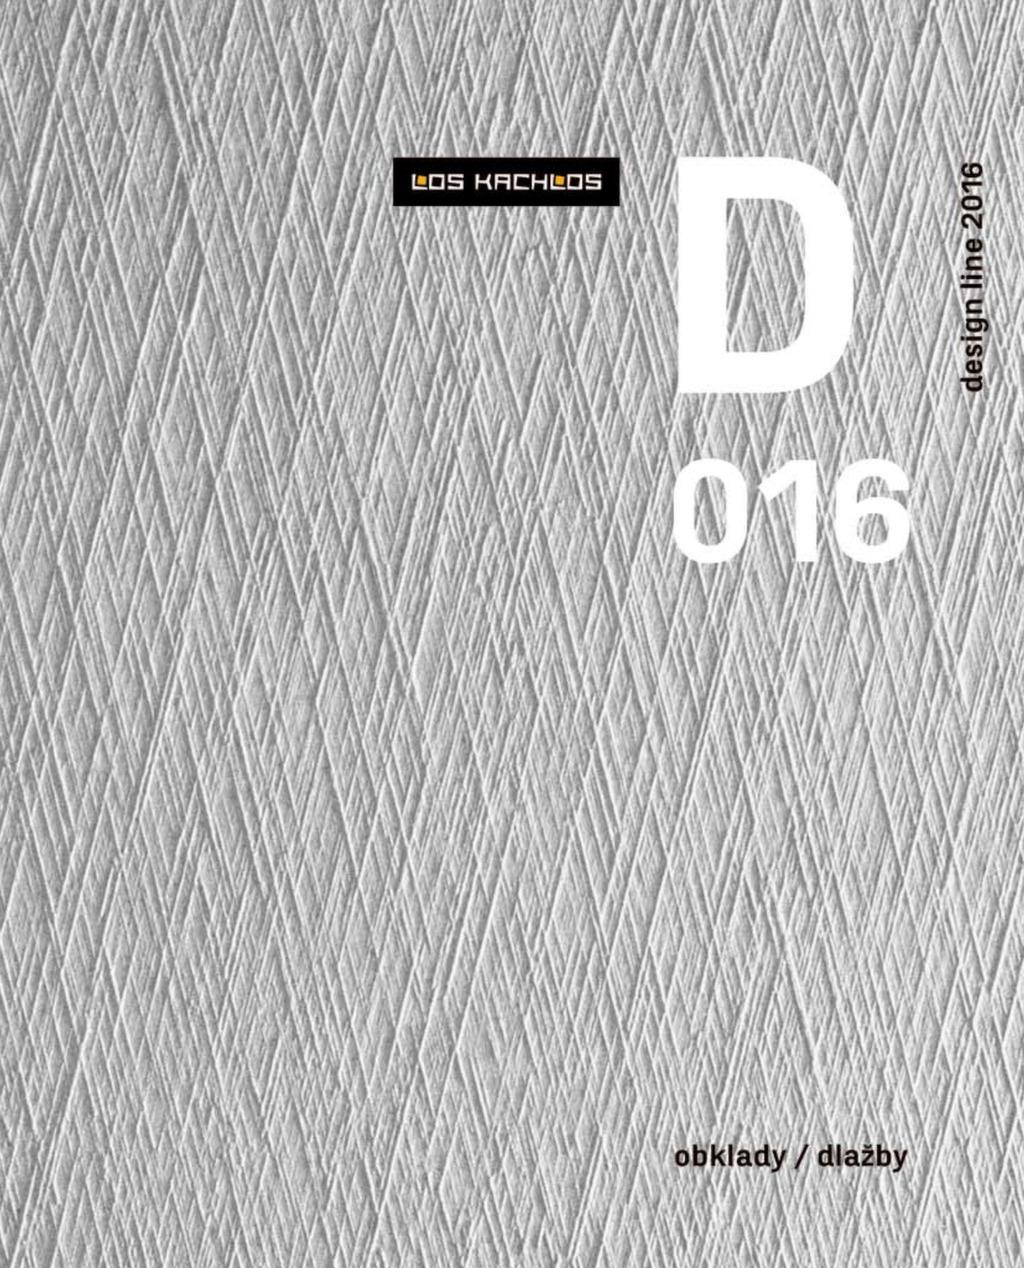 pdf-76132-page-00001.jpg